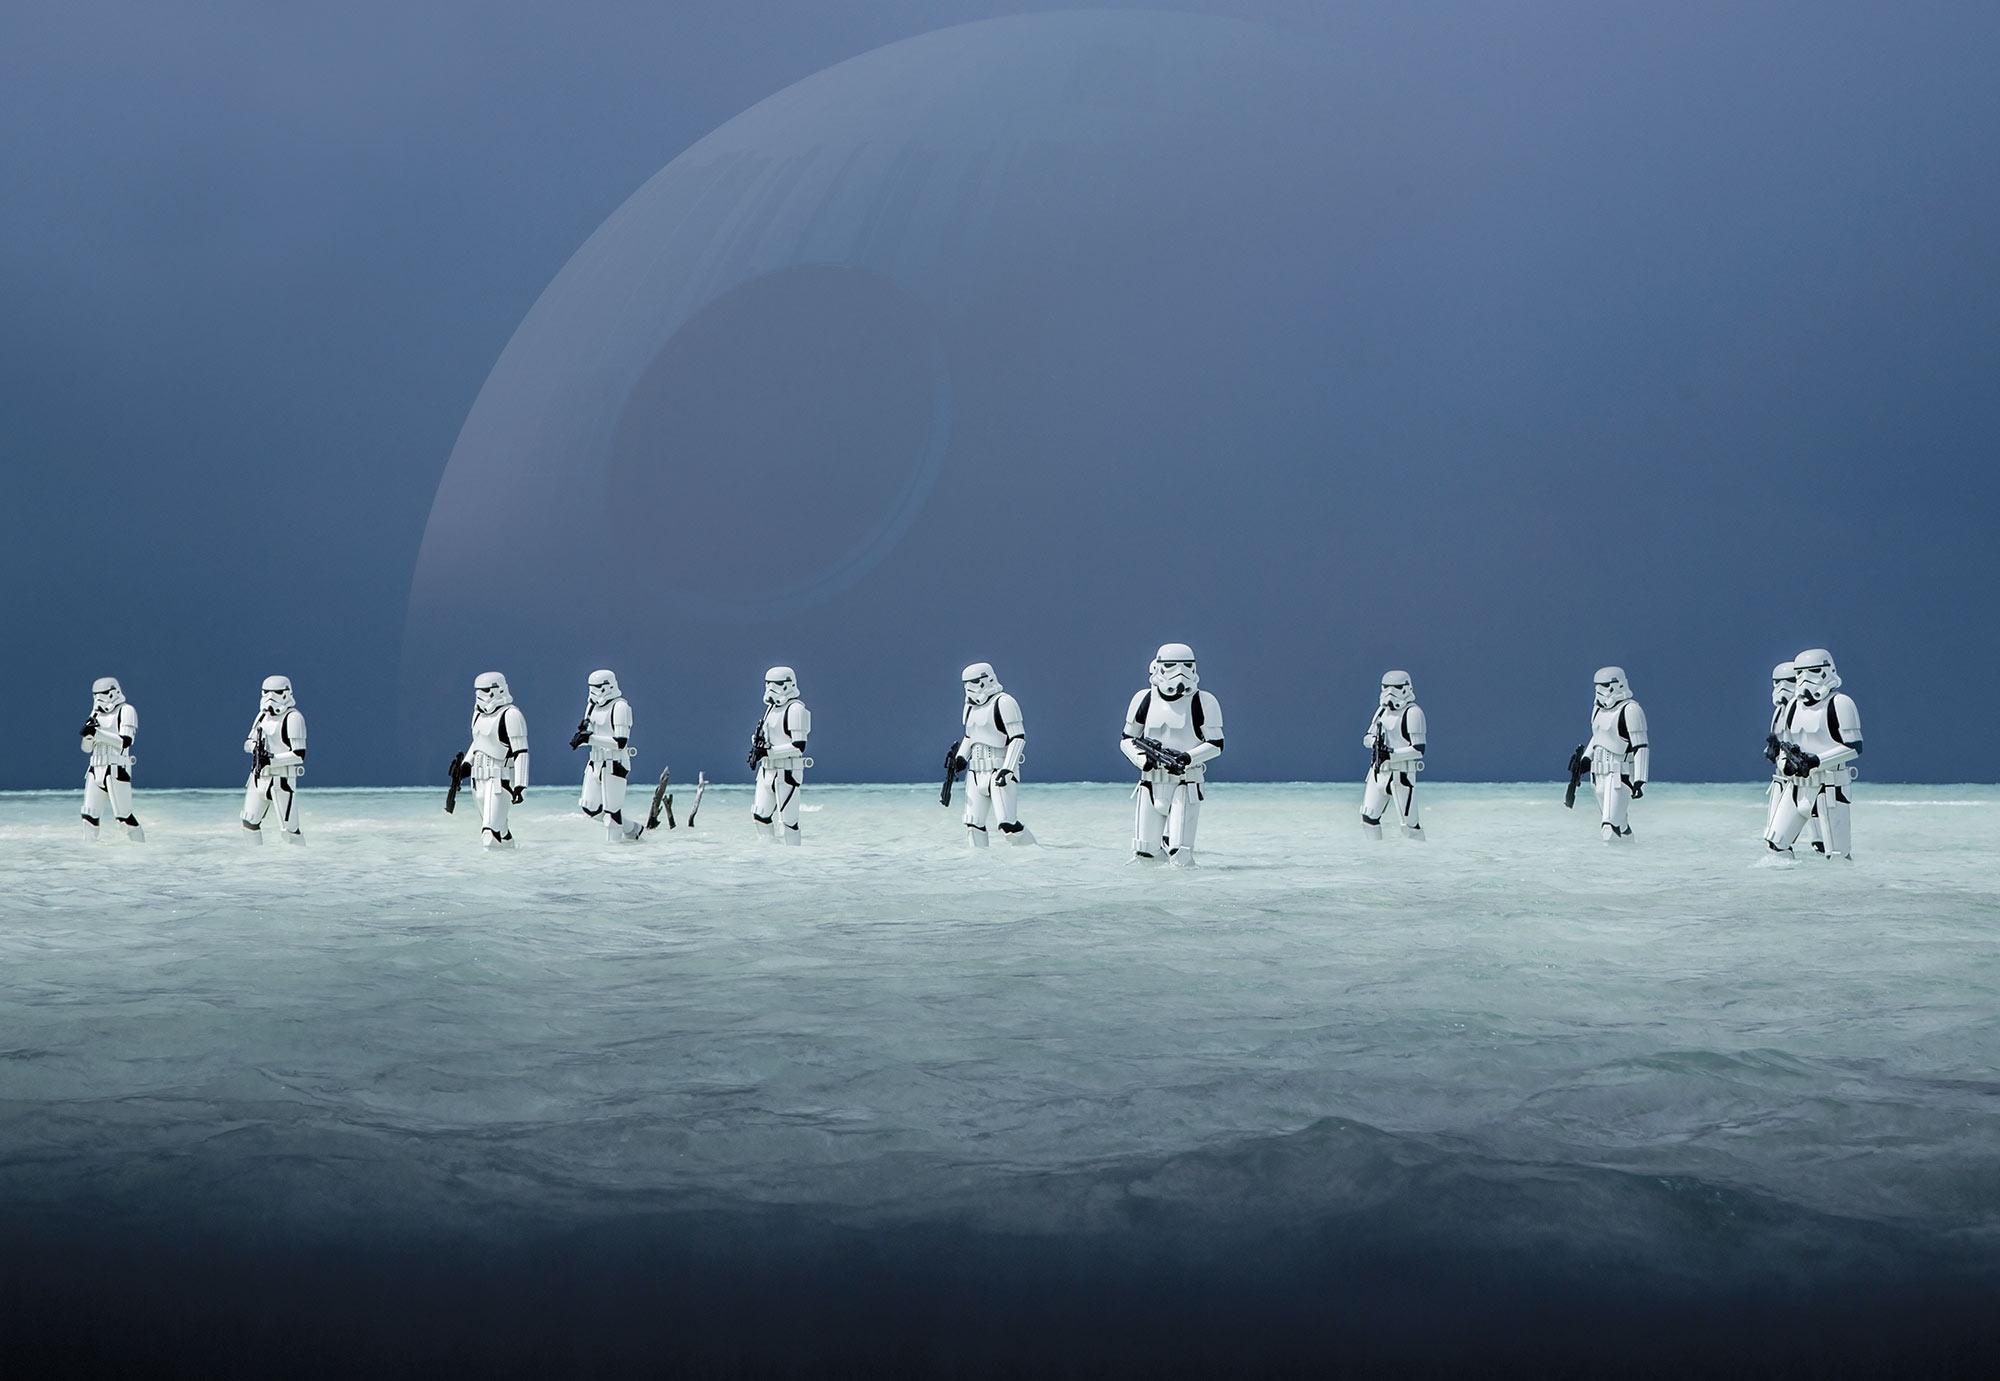 Disney Edition 4 Kinderbehang Komar - Kinderkamer behang STAR WARS SCARIF BEACH